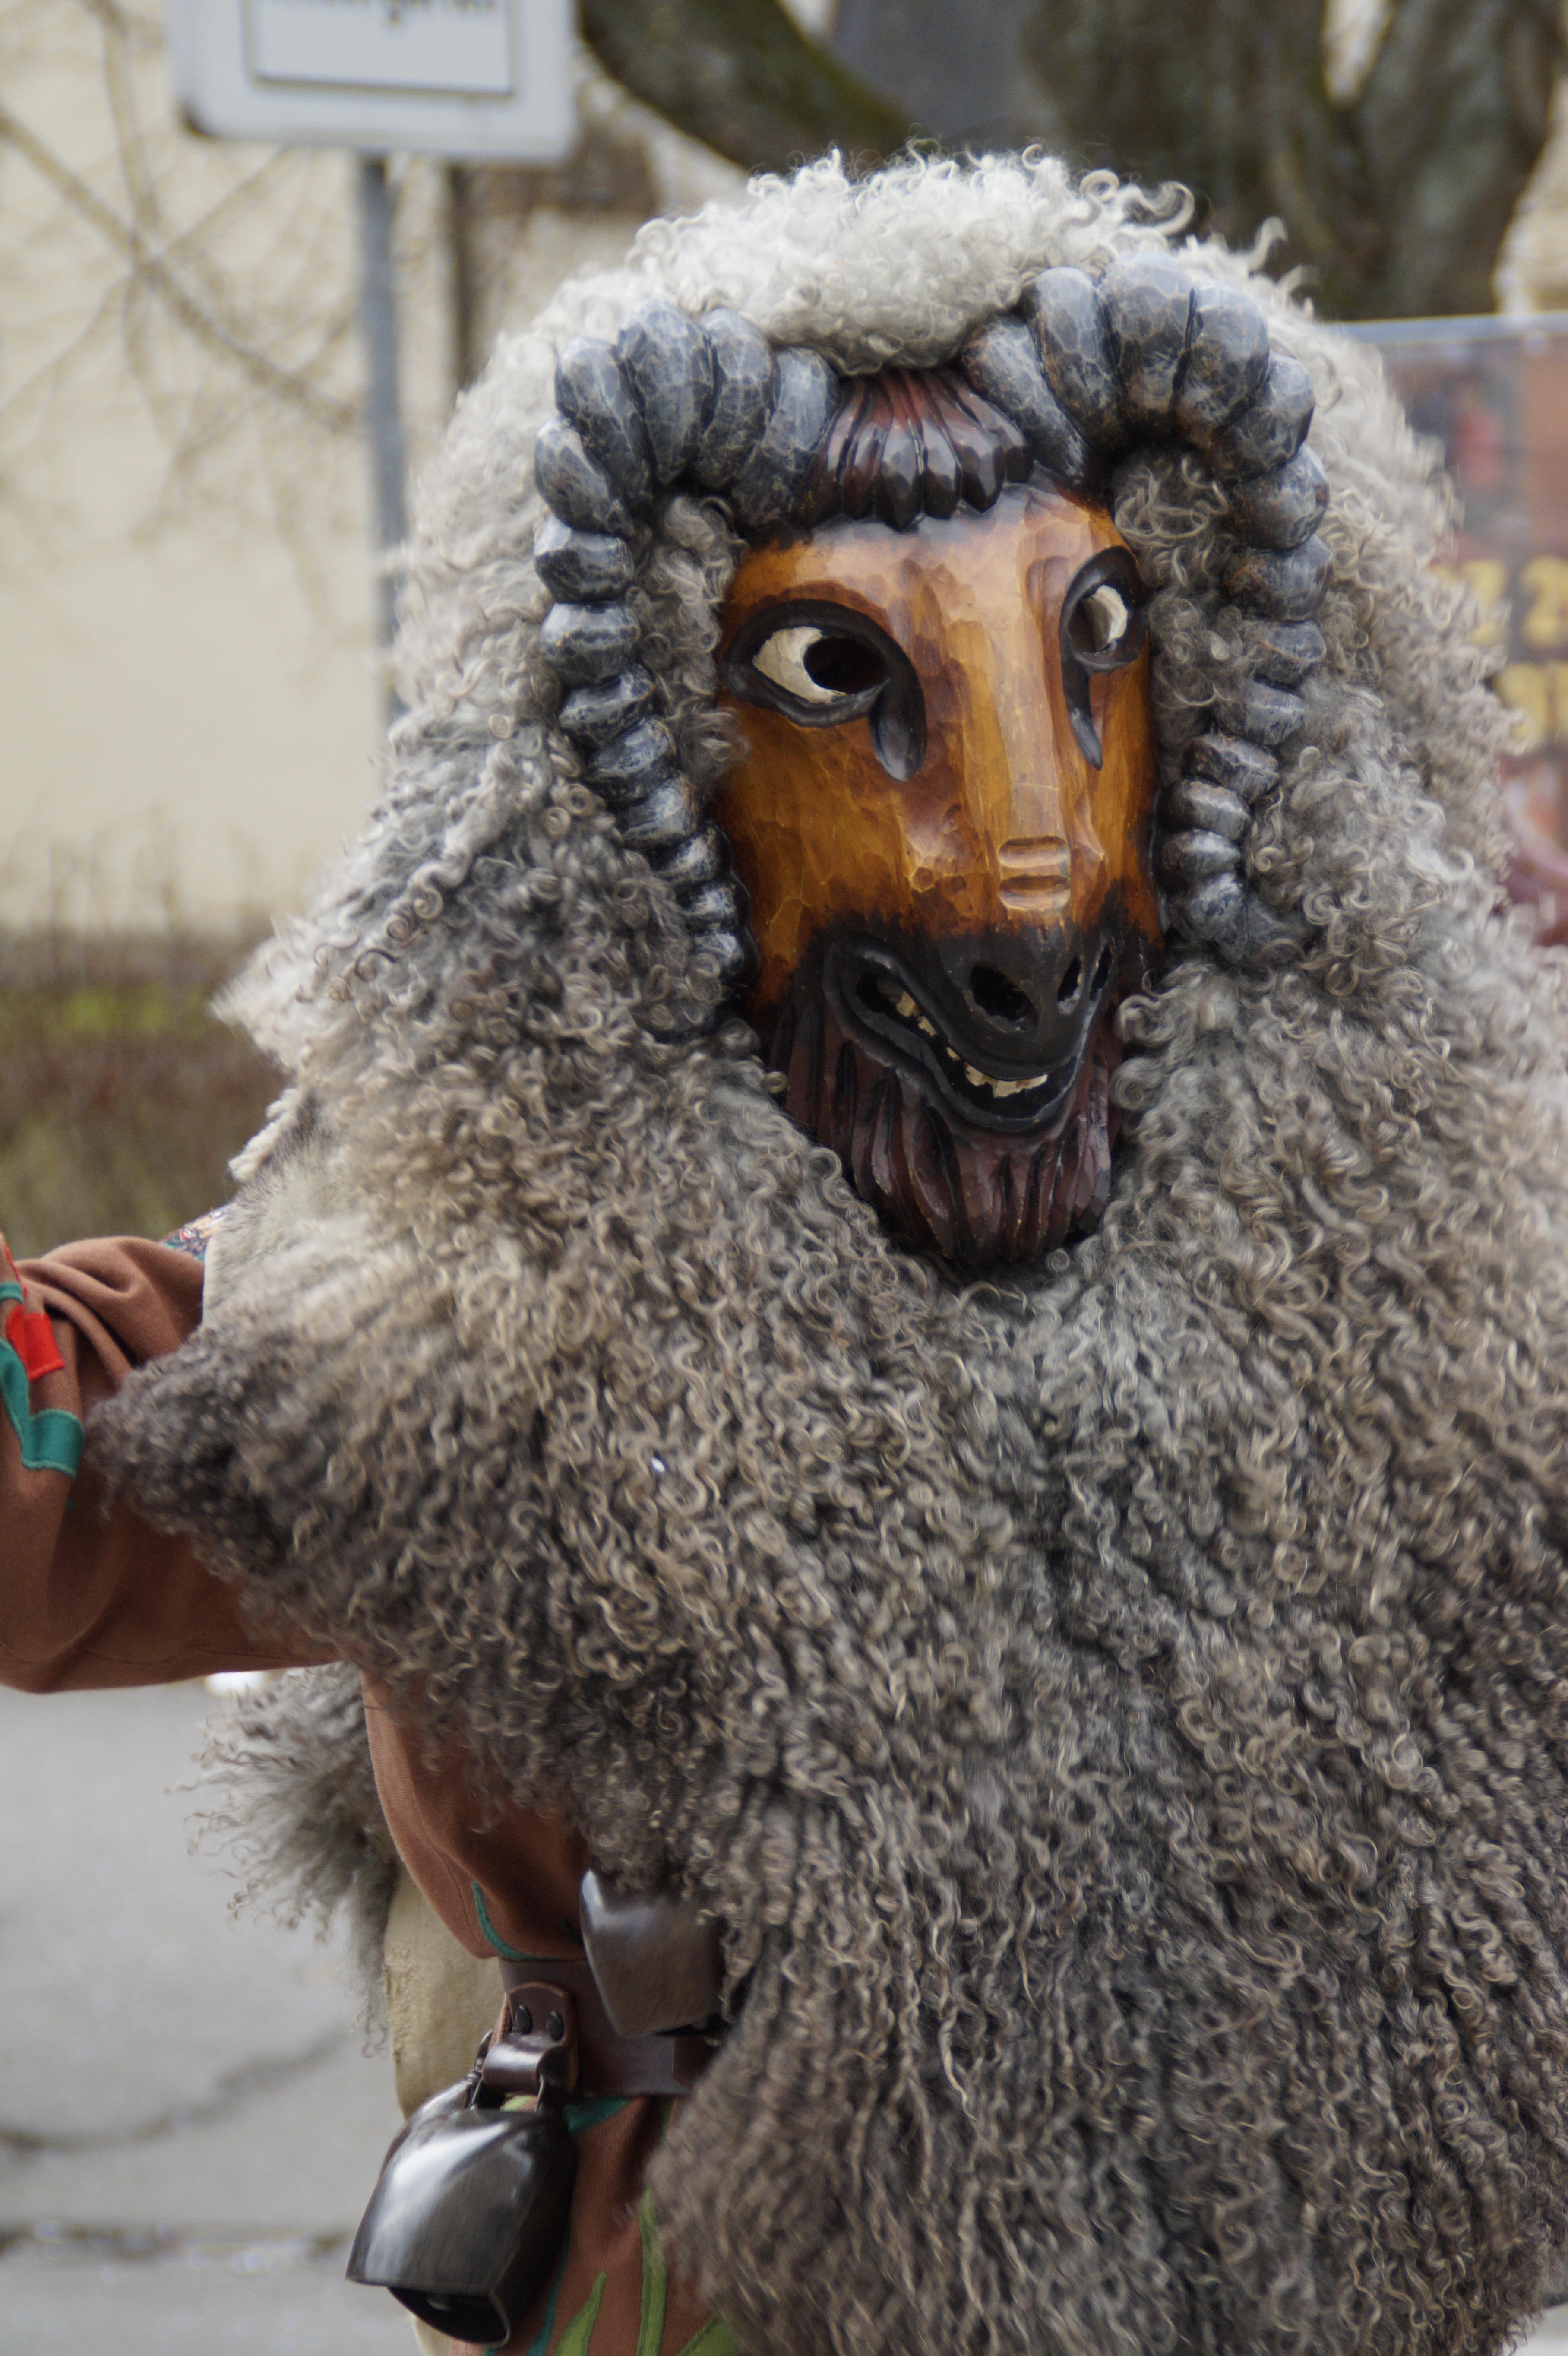 Vineyard Animal Goat Fur Portrait Carnival Sheep Dressed Up Face Mask Figure Move Germany Carved Custom